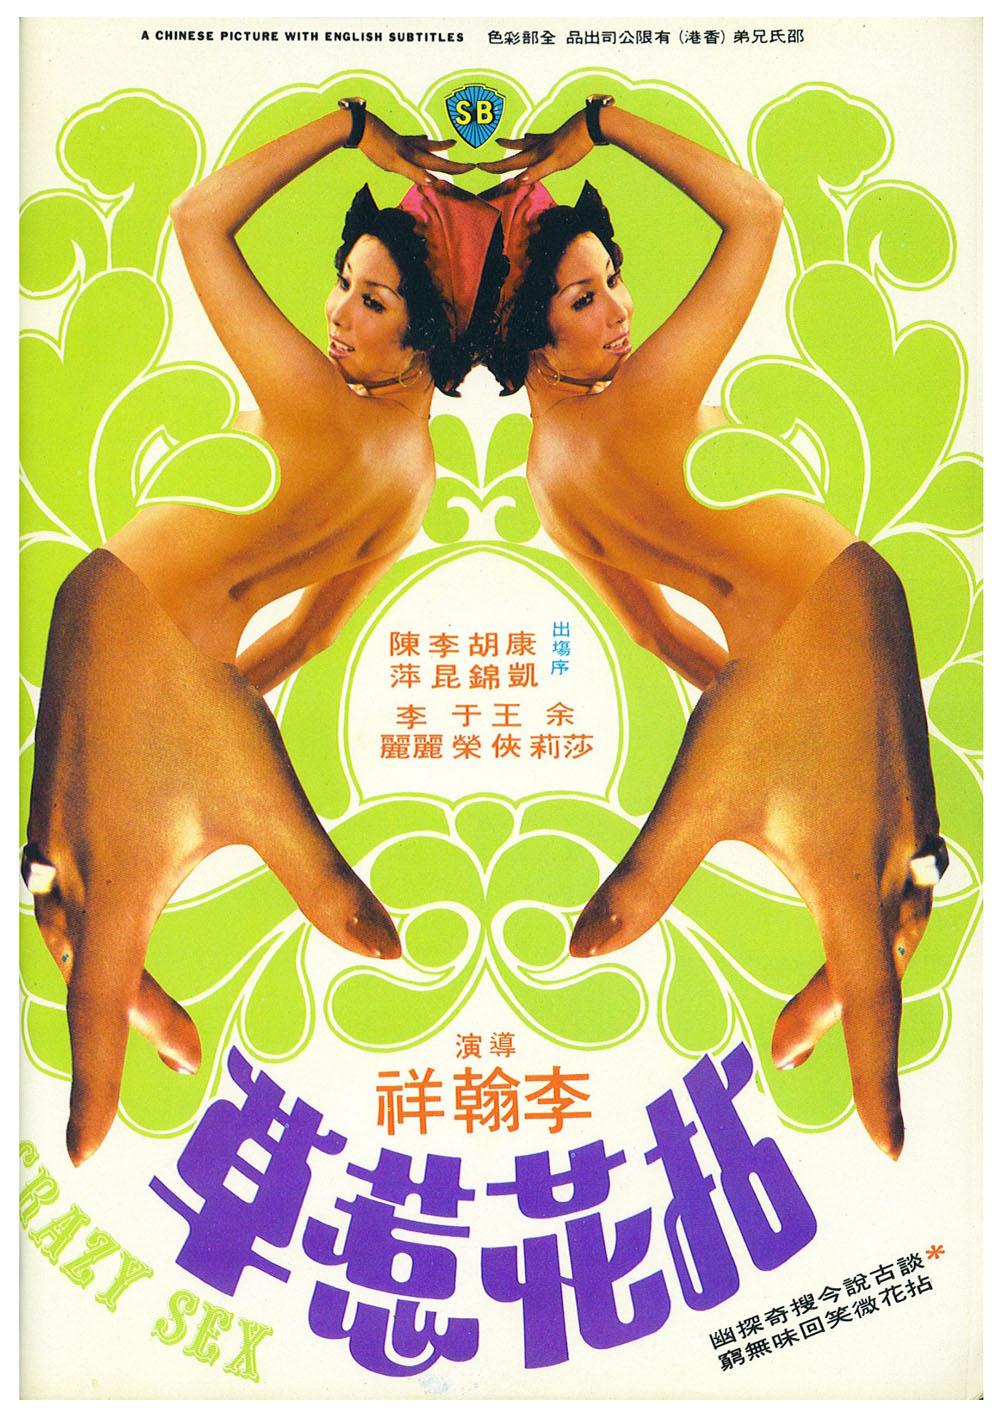 http://4.bp.blogspot.com/-H9jvD14nlUY/UVsT2YYTO8I/AAAAAAAAJ84/SXTQ04zzN-8/s1600/Crazy+Sex+(1976).jpg